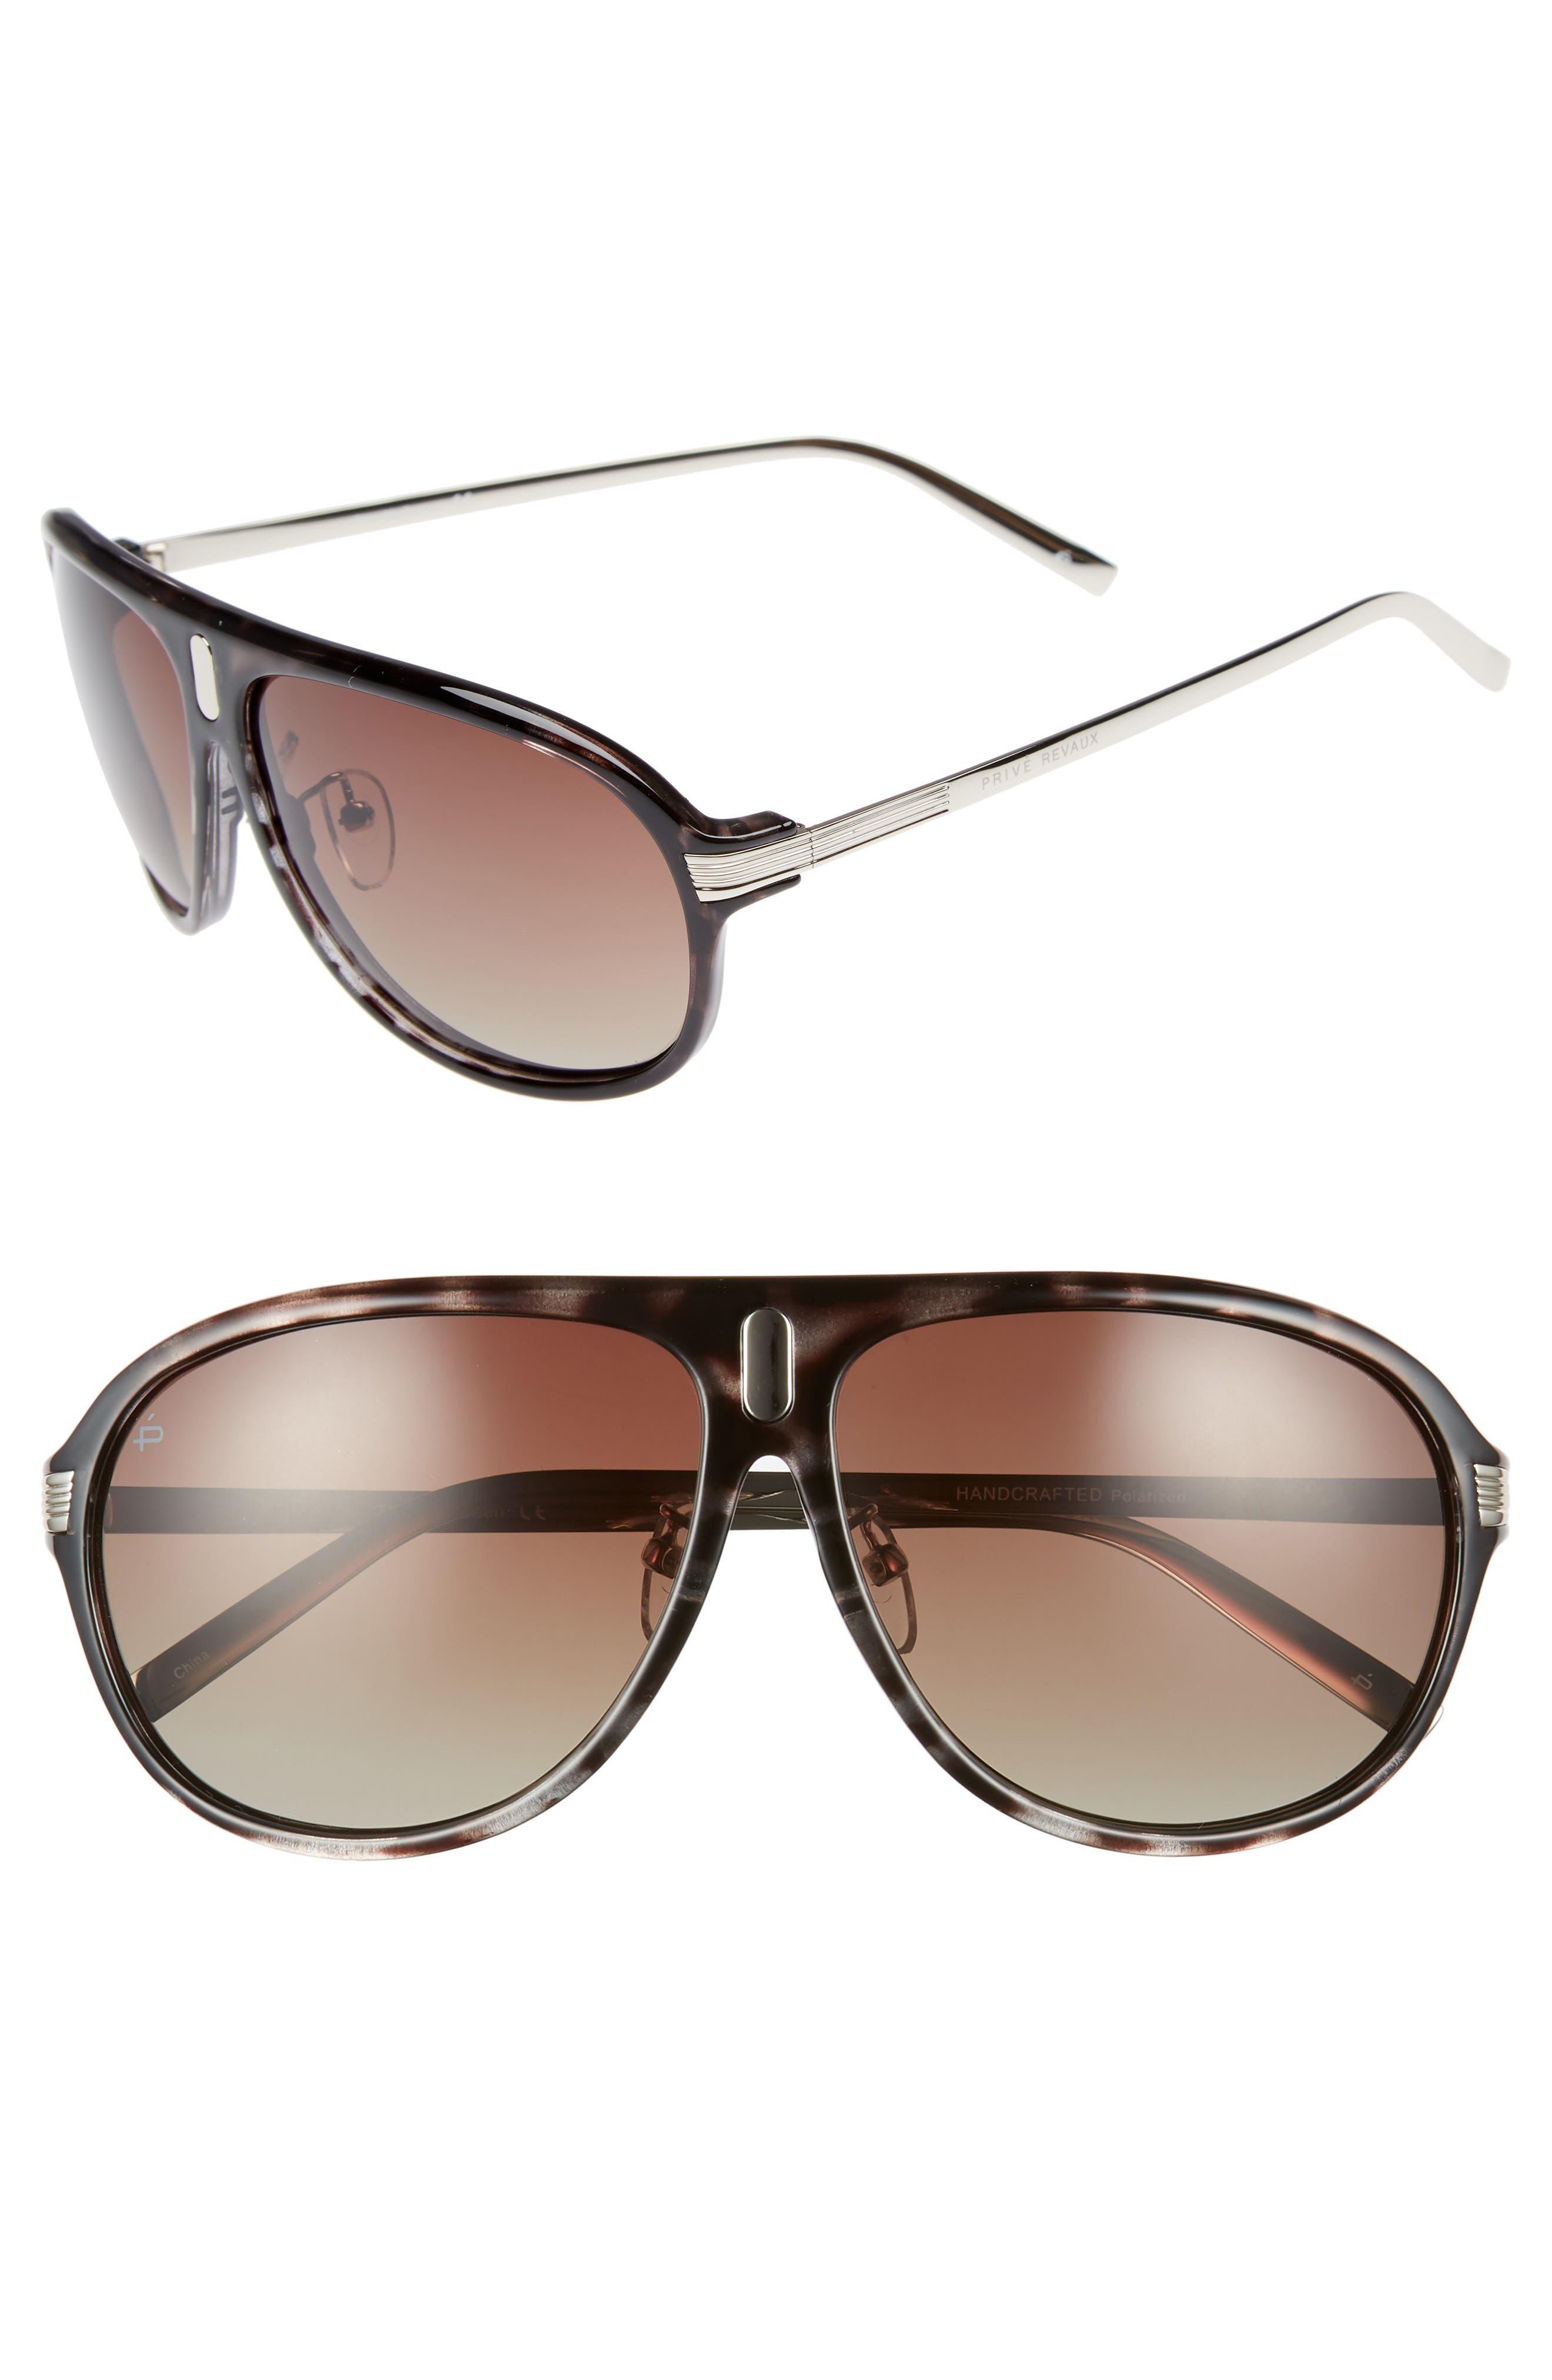 Privé Revaux The McQueen 62mm Polarized Aviator Sunglasses,                             Main thumbnail 1, color,                             Grey